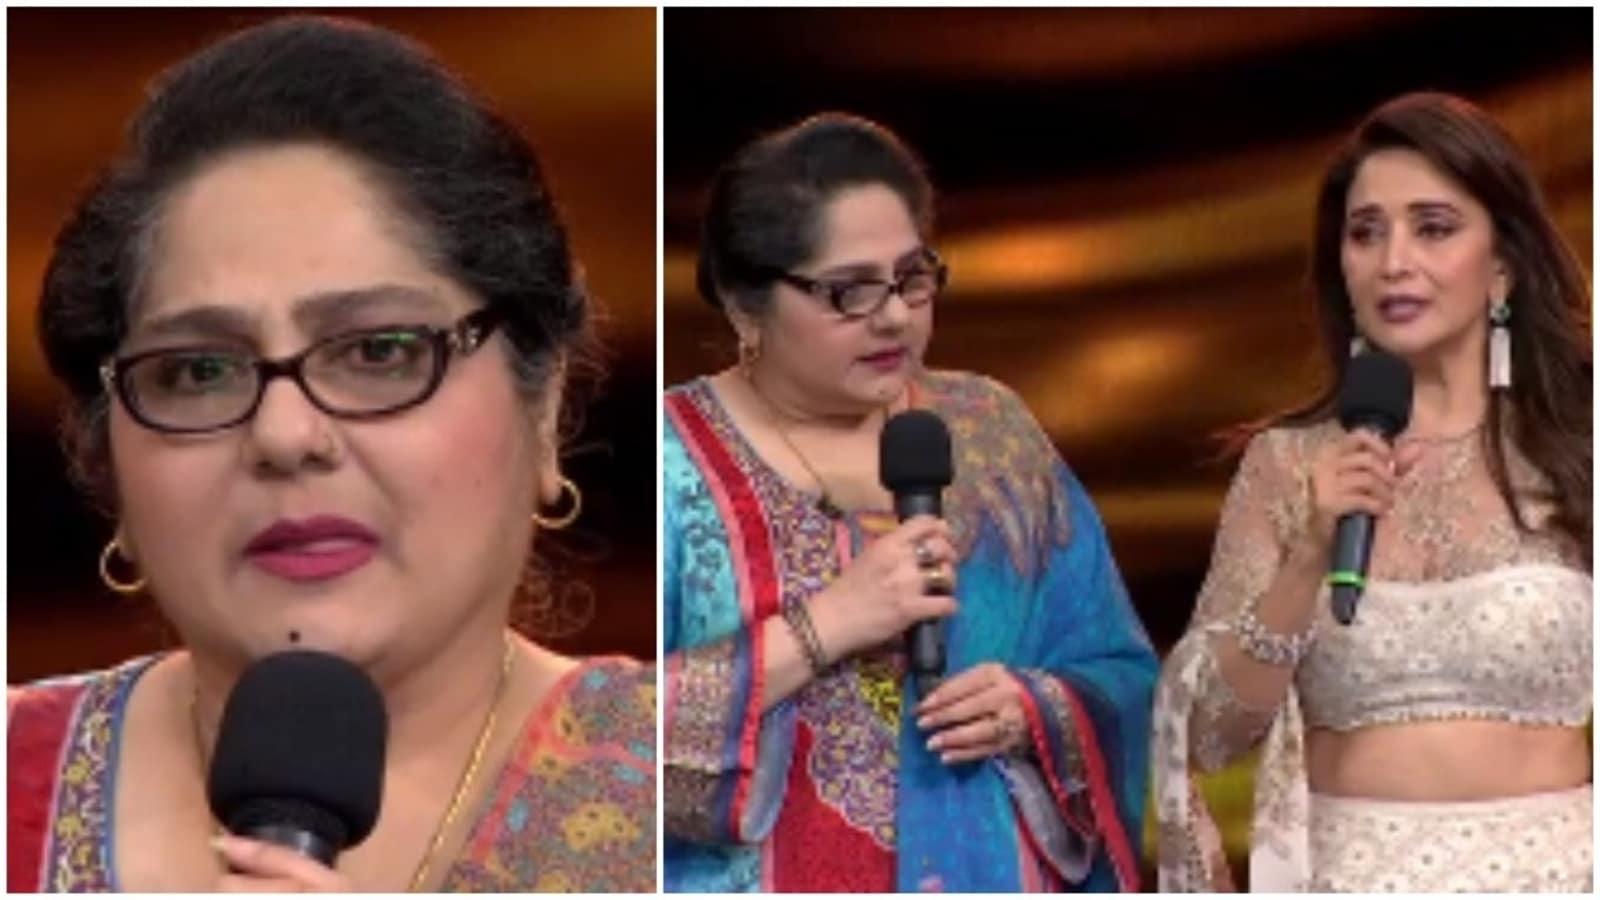 Shagufta Ali gets aid of ₹5 lakh from Madhuri Dixit on behalf of Dance Deewane team, says 'I have no words' | Bollywood - Hindustan Times